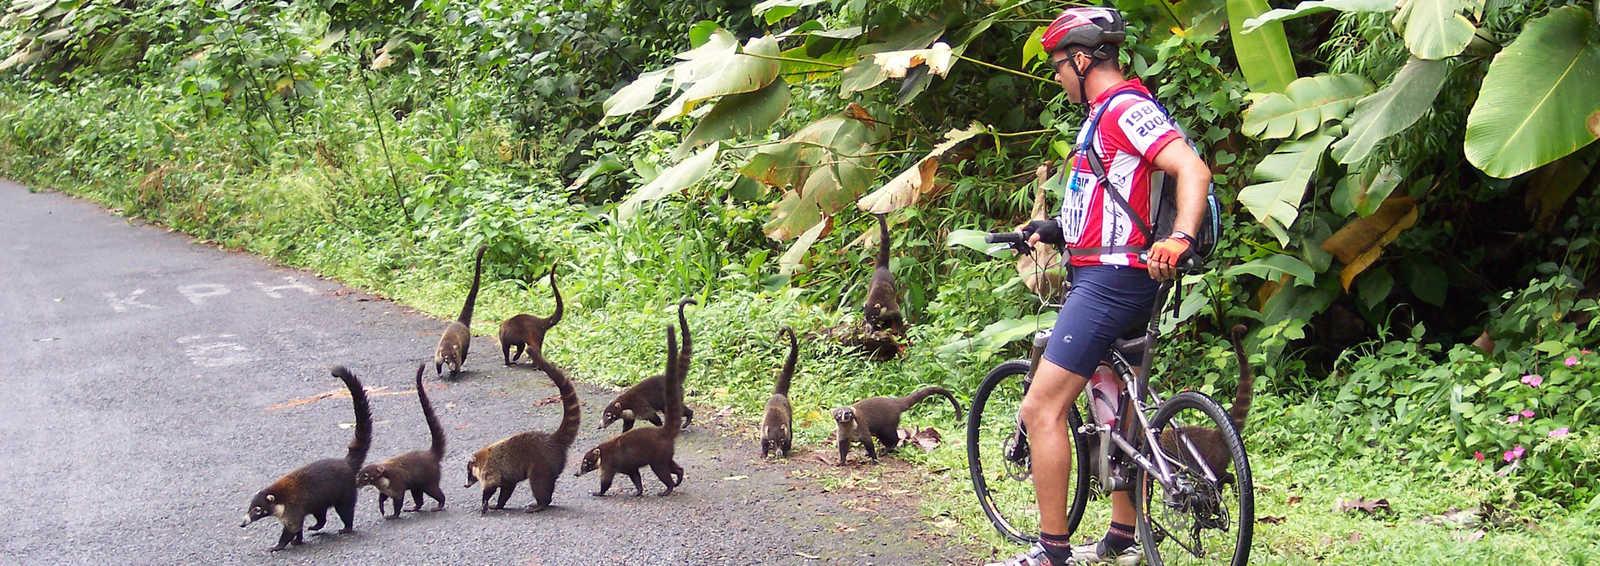 Coatimundi crossing a jungle road with cyclist, Costa Rica